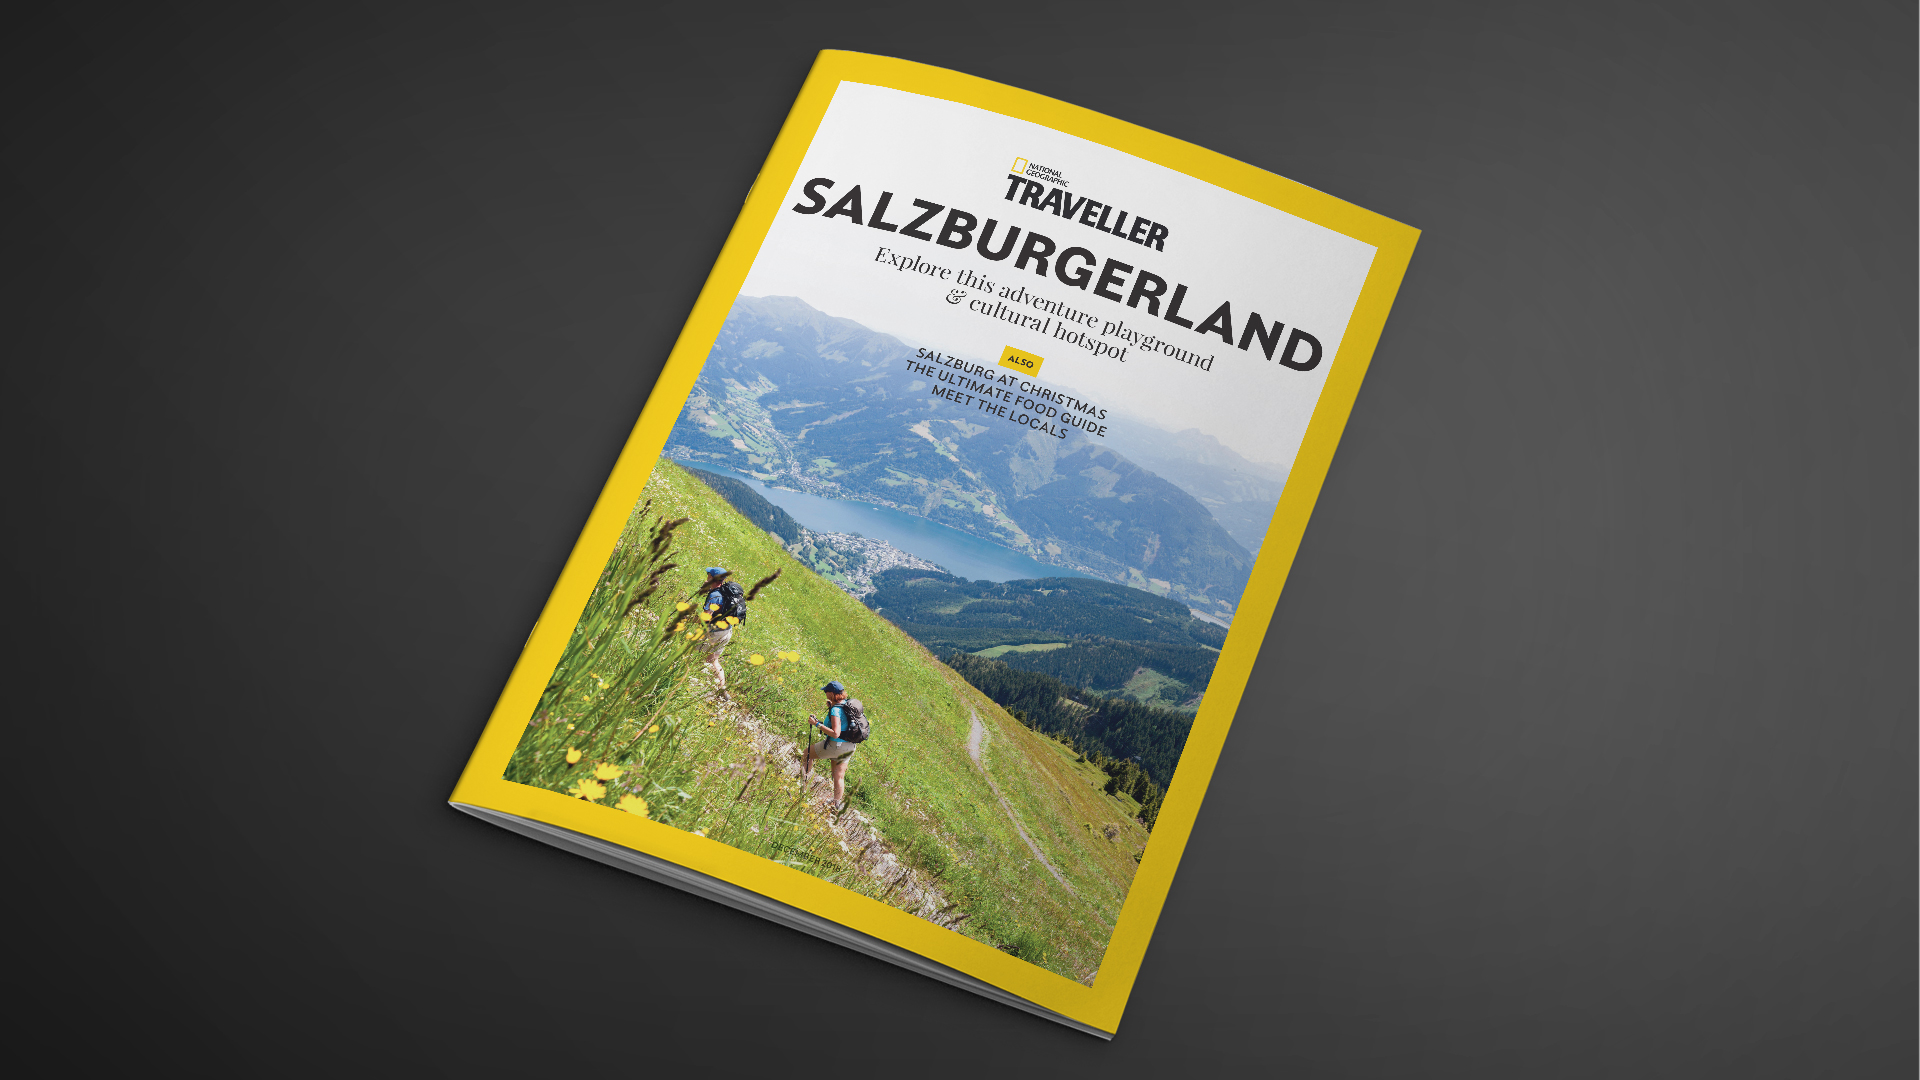 COVER-NGT-SALZBURGERLAND-1920px